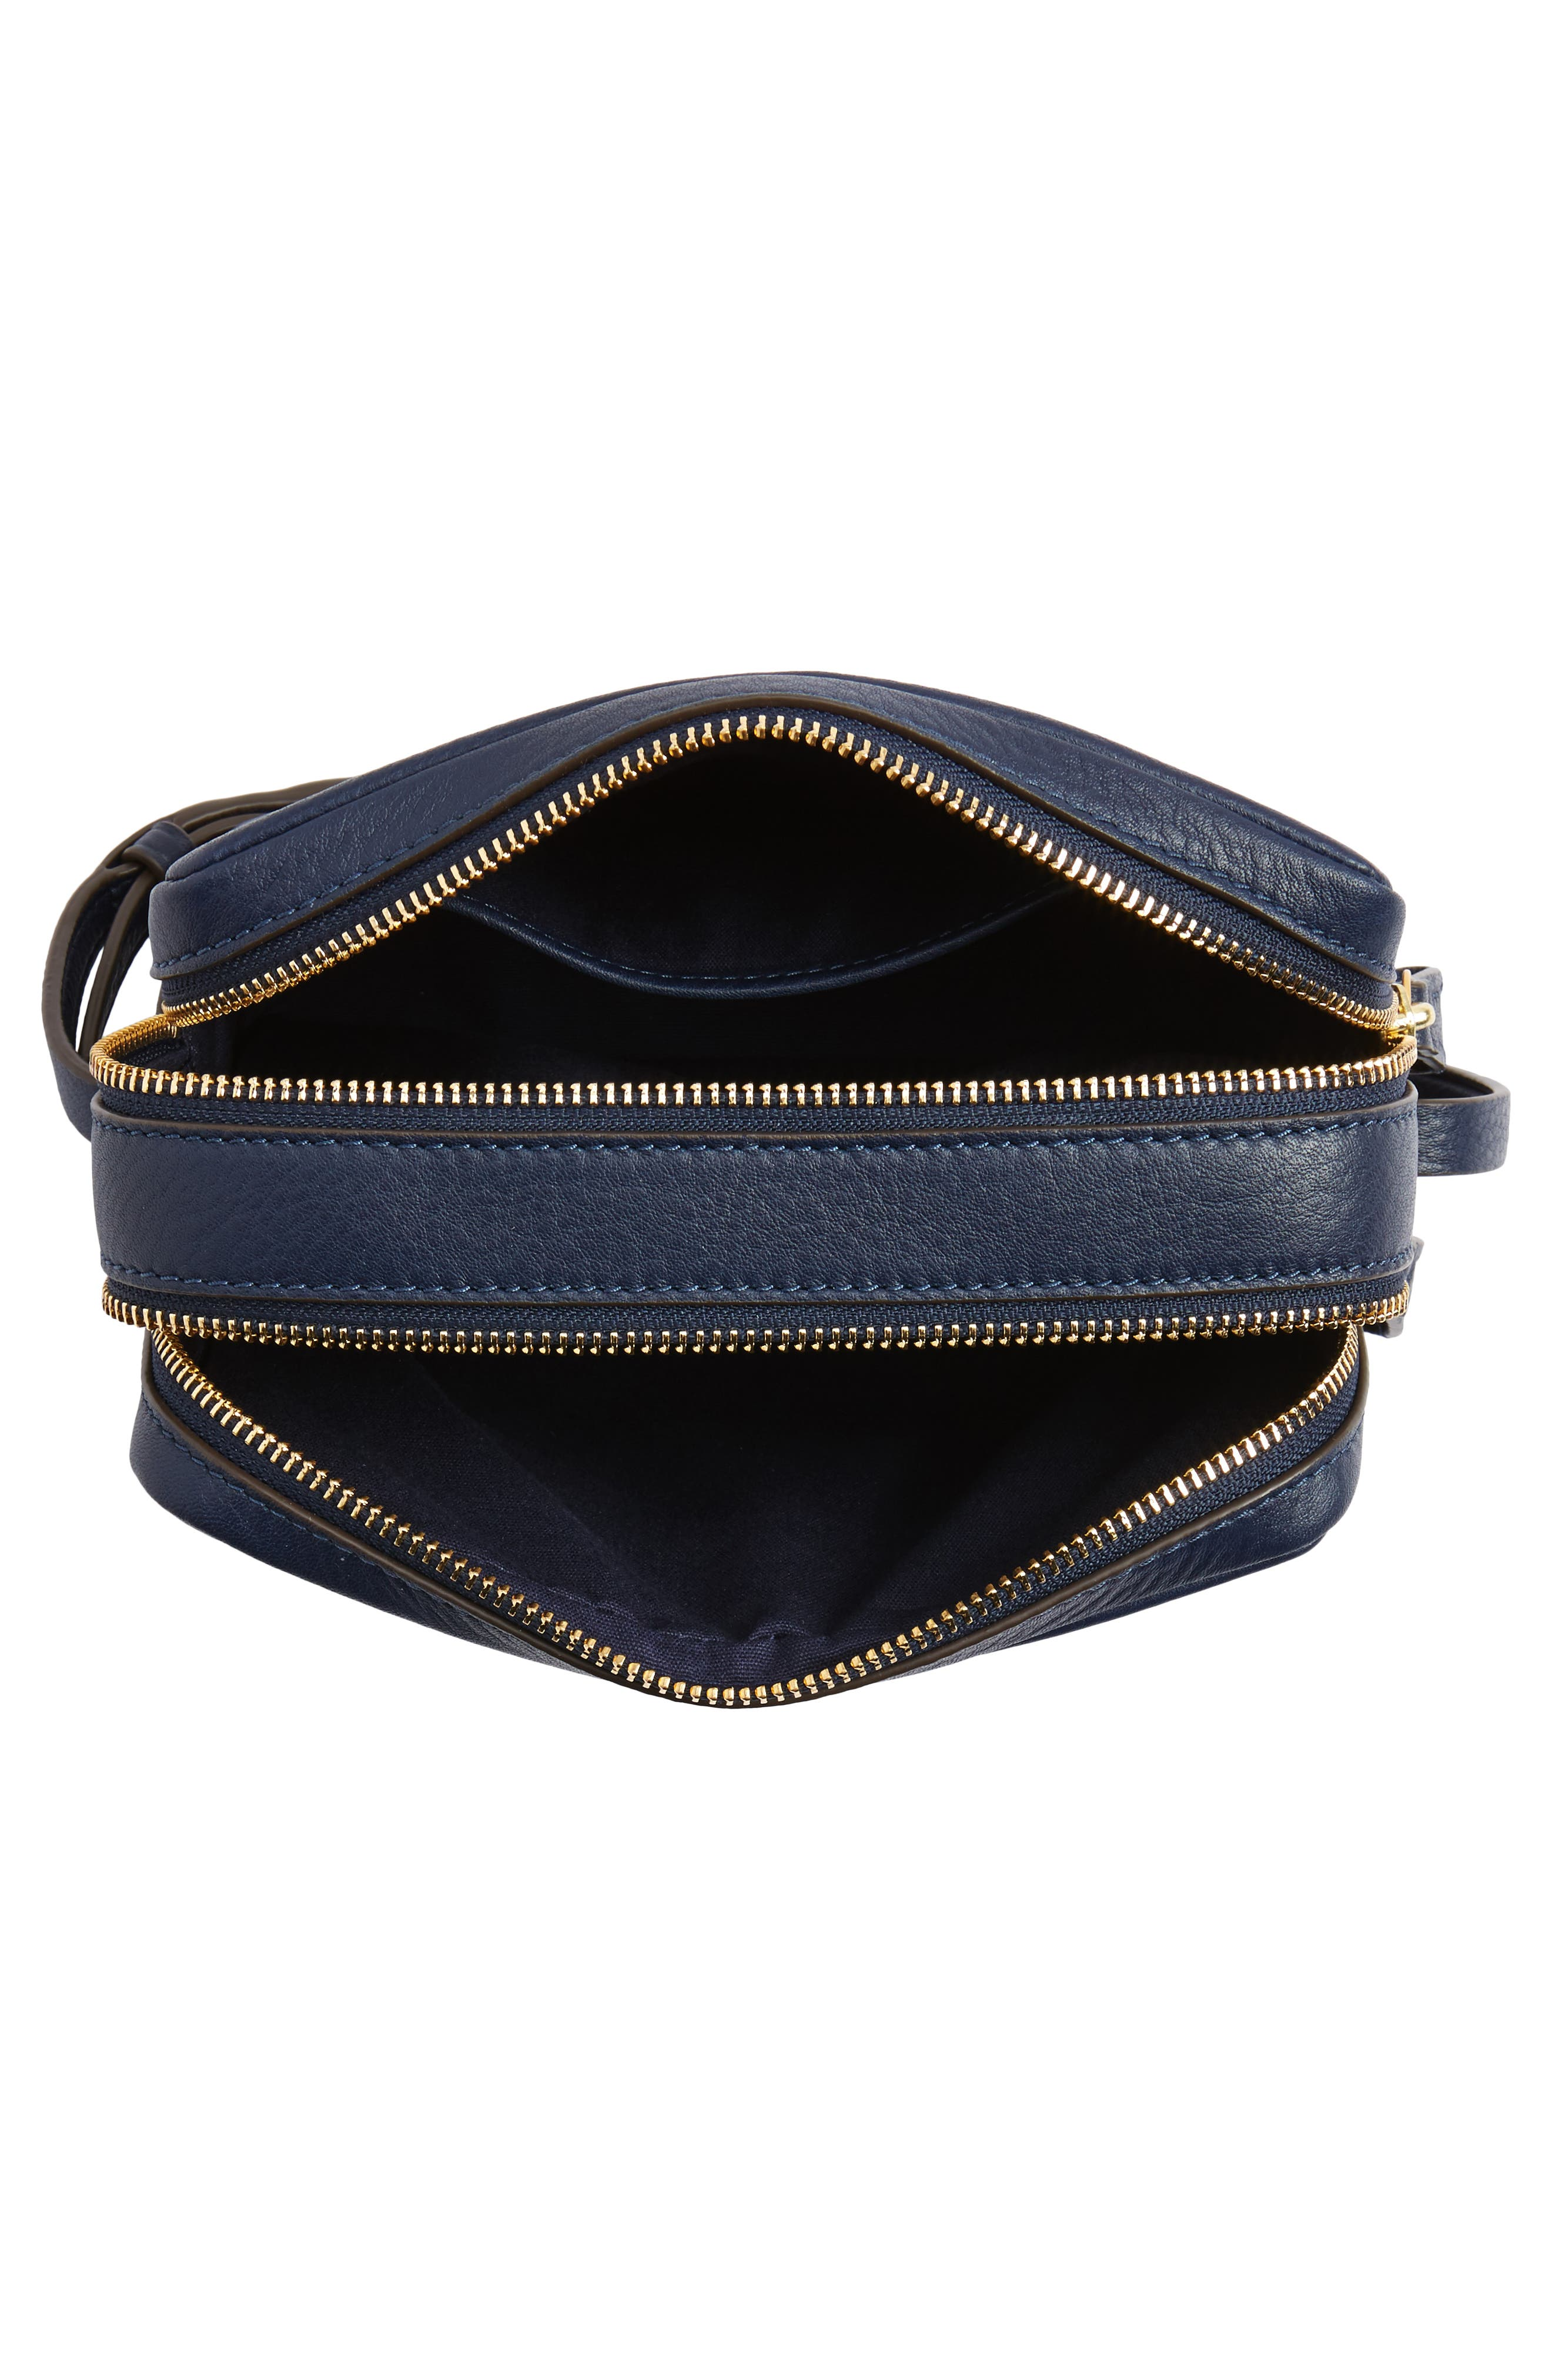 Block-T Double Zip Leather Crossbody Bag,                             Alternate thumbnail 8, color,